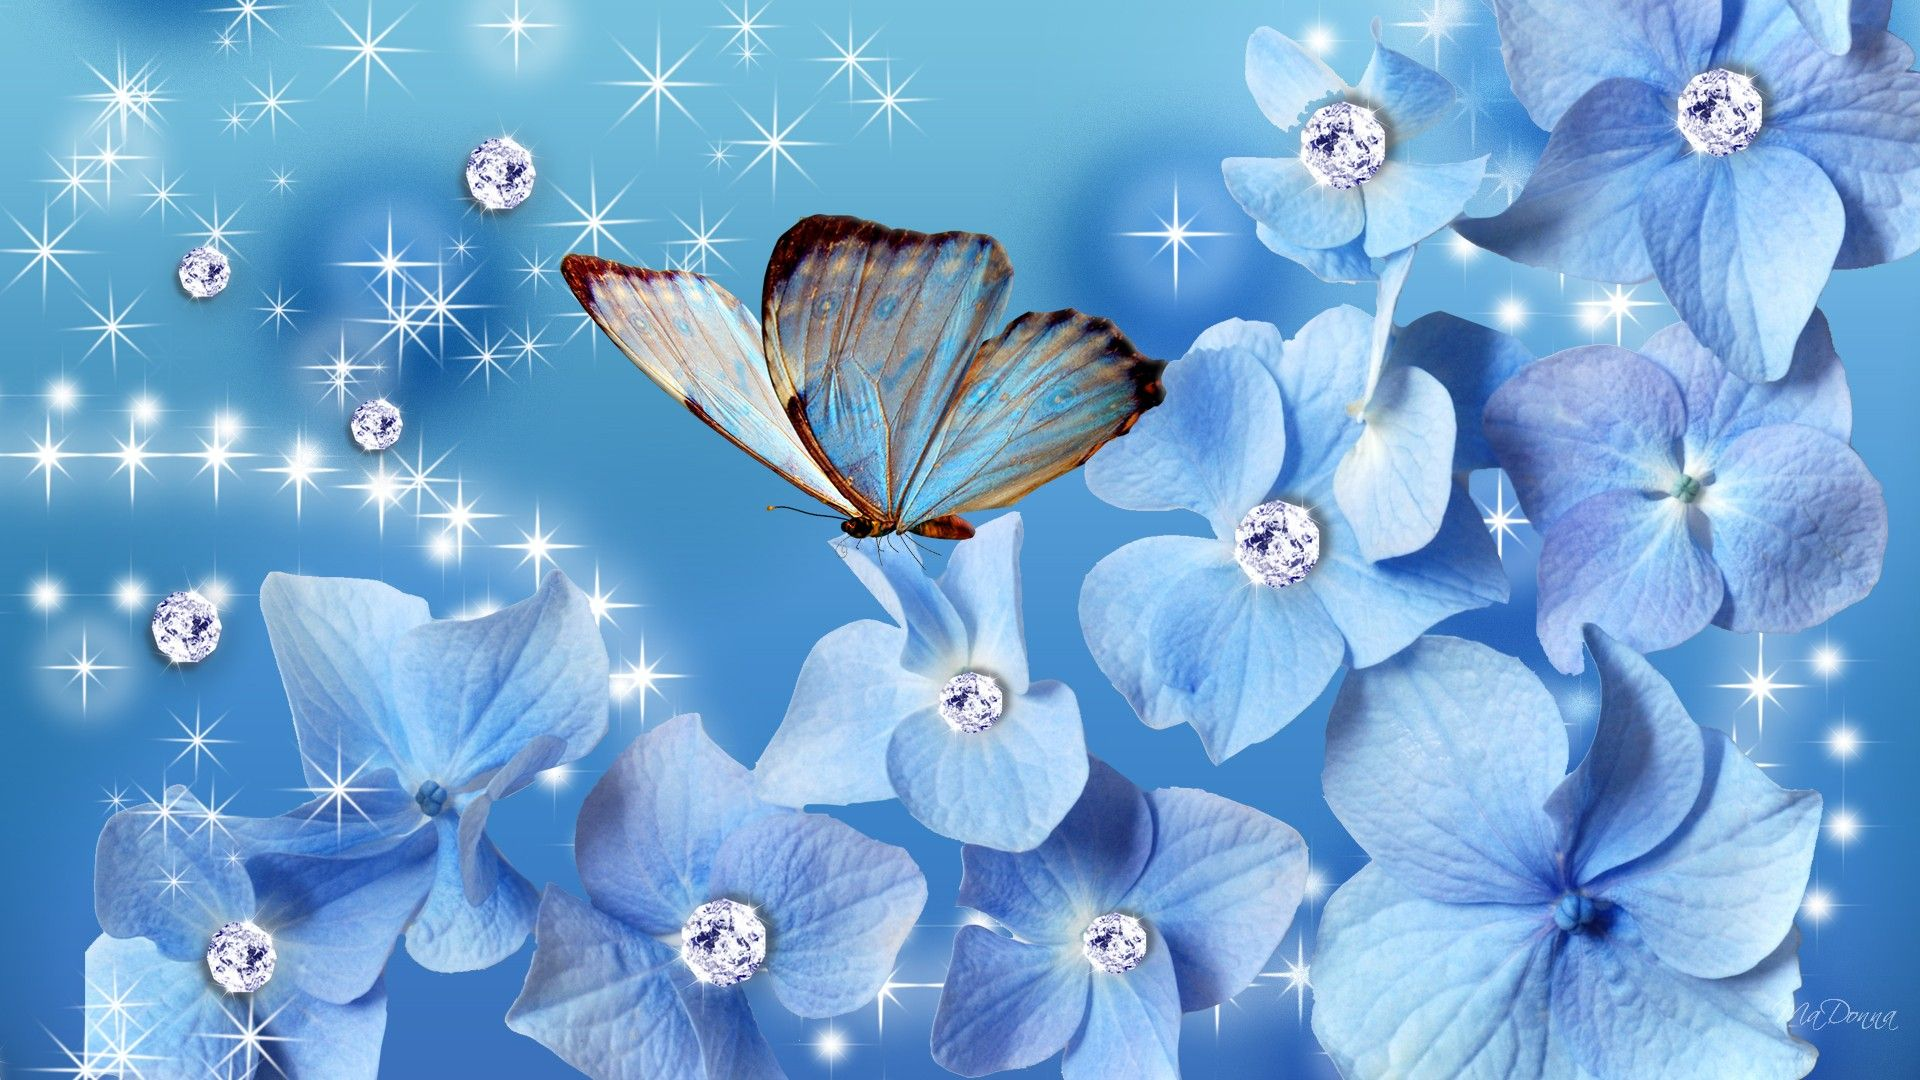 Blue Butterfly Wallpapers - Top Free Blue Butterfly ...